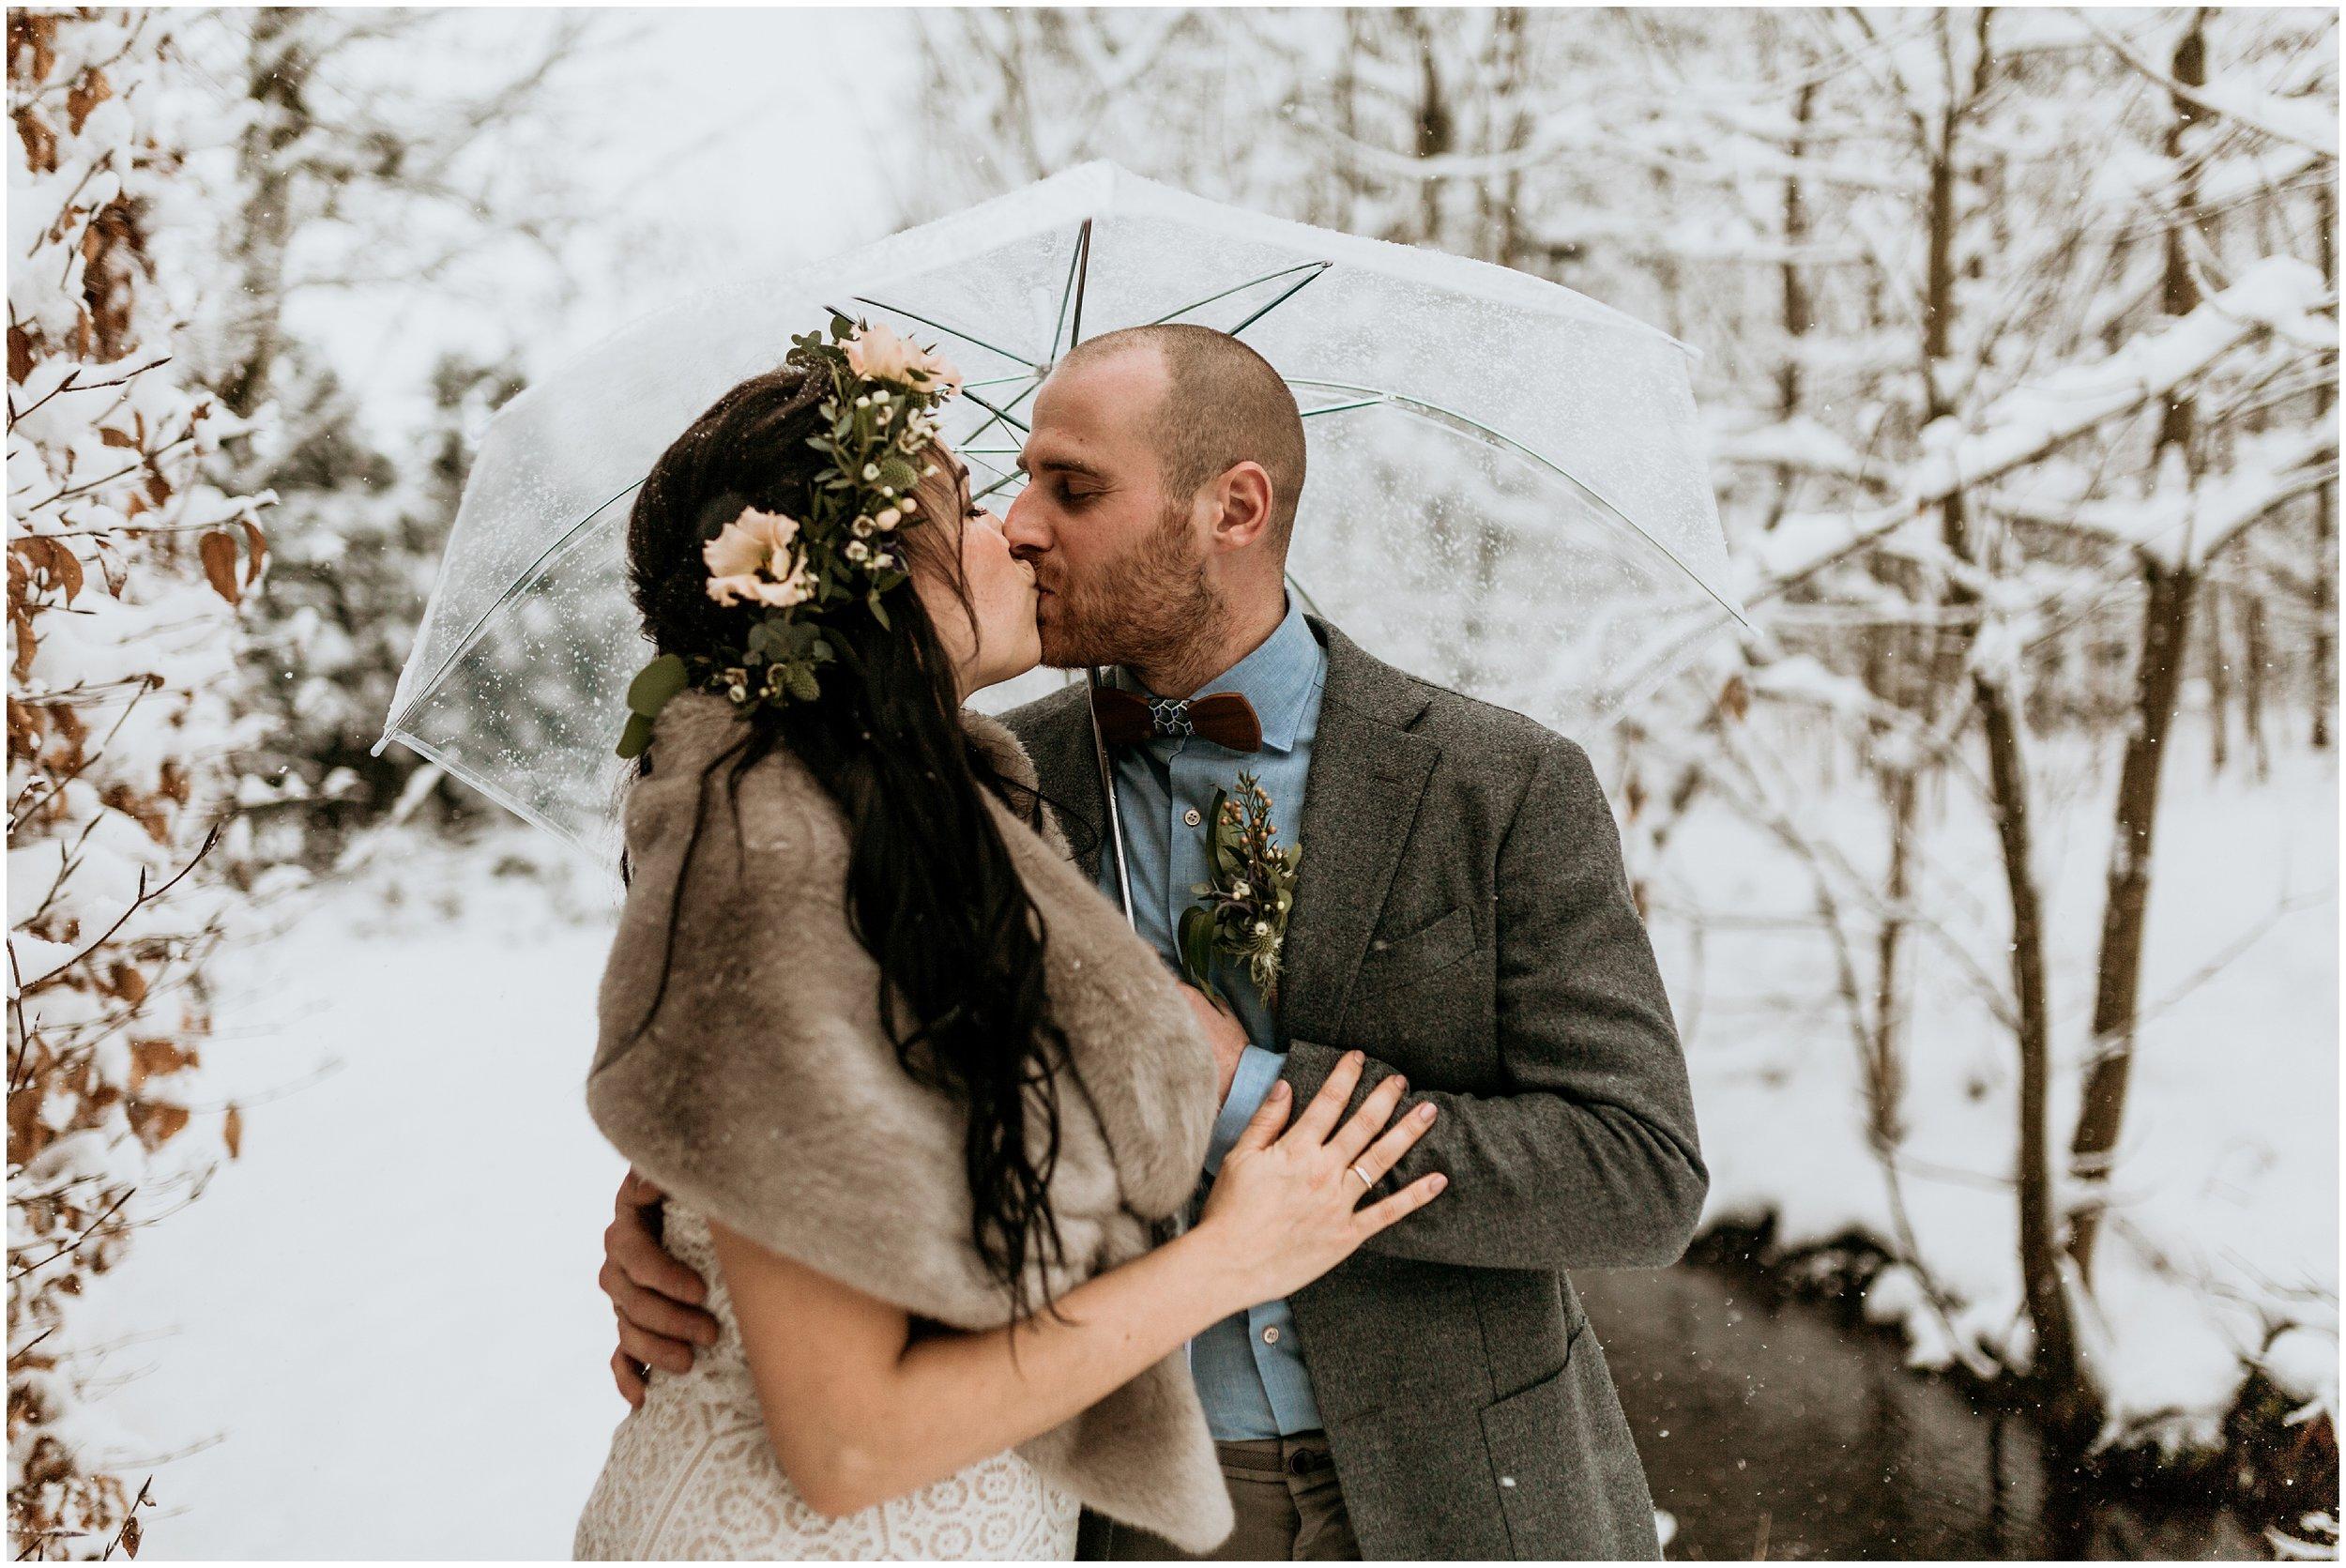 huwelijksfotografie-jana-joeri-ardennen-sechery_0019.jpg